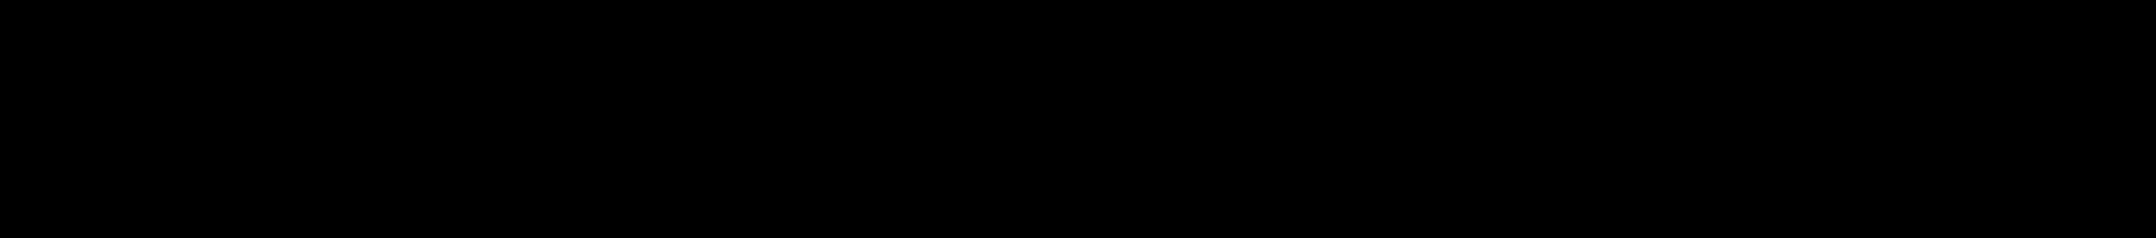 panerai logo 1 - Panerai Logo